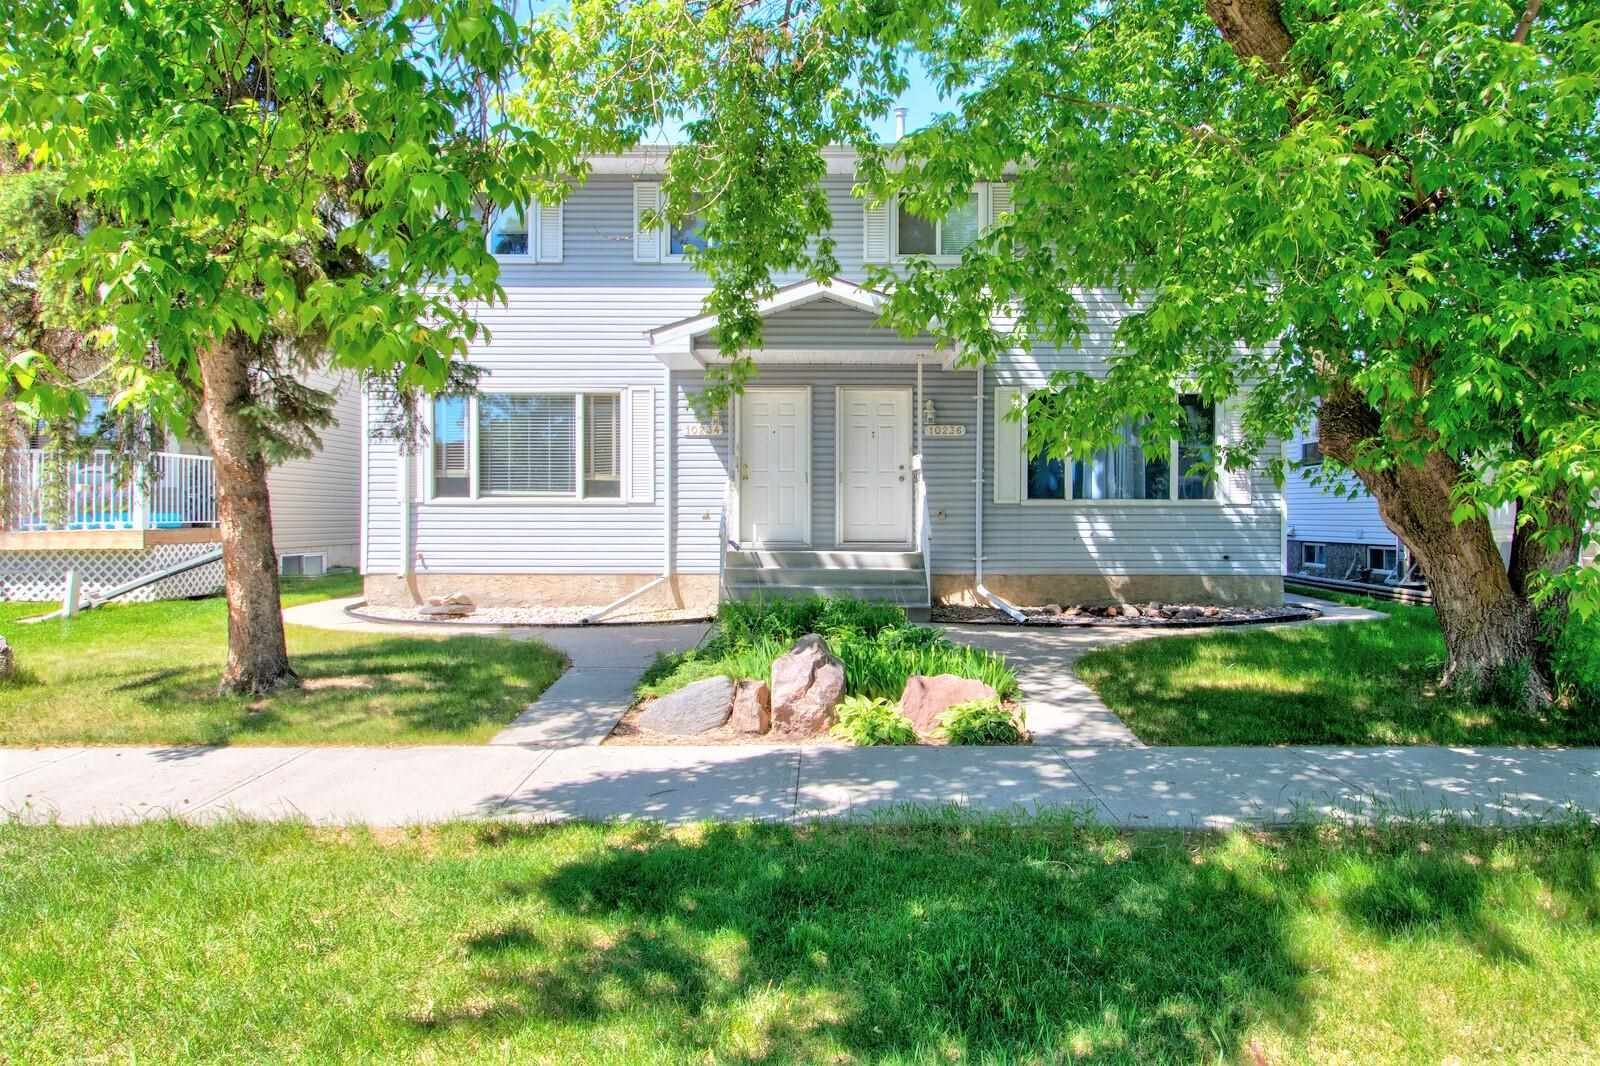 Main Photo: 10234 152 Street in Edmonton: Zone 21 House Half Duplex for sale : MLS®# E4249601